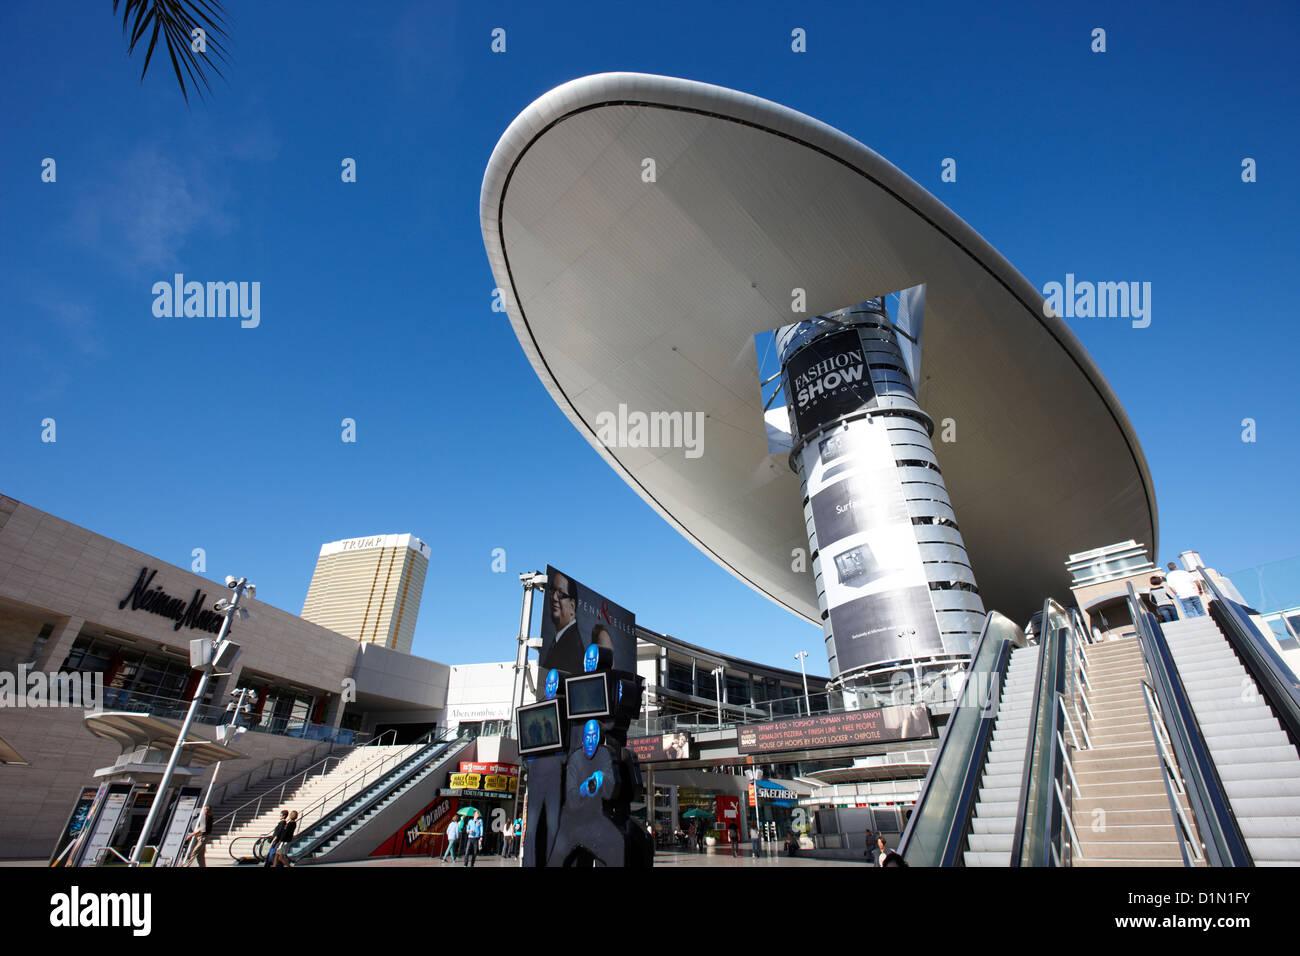 La nube de Fashion Show mall Strip de Las Vegas, Nevada, EE.UU. Imagen De Stock